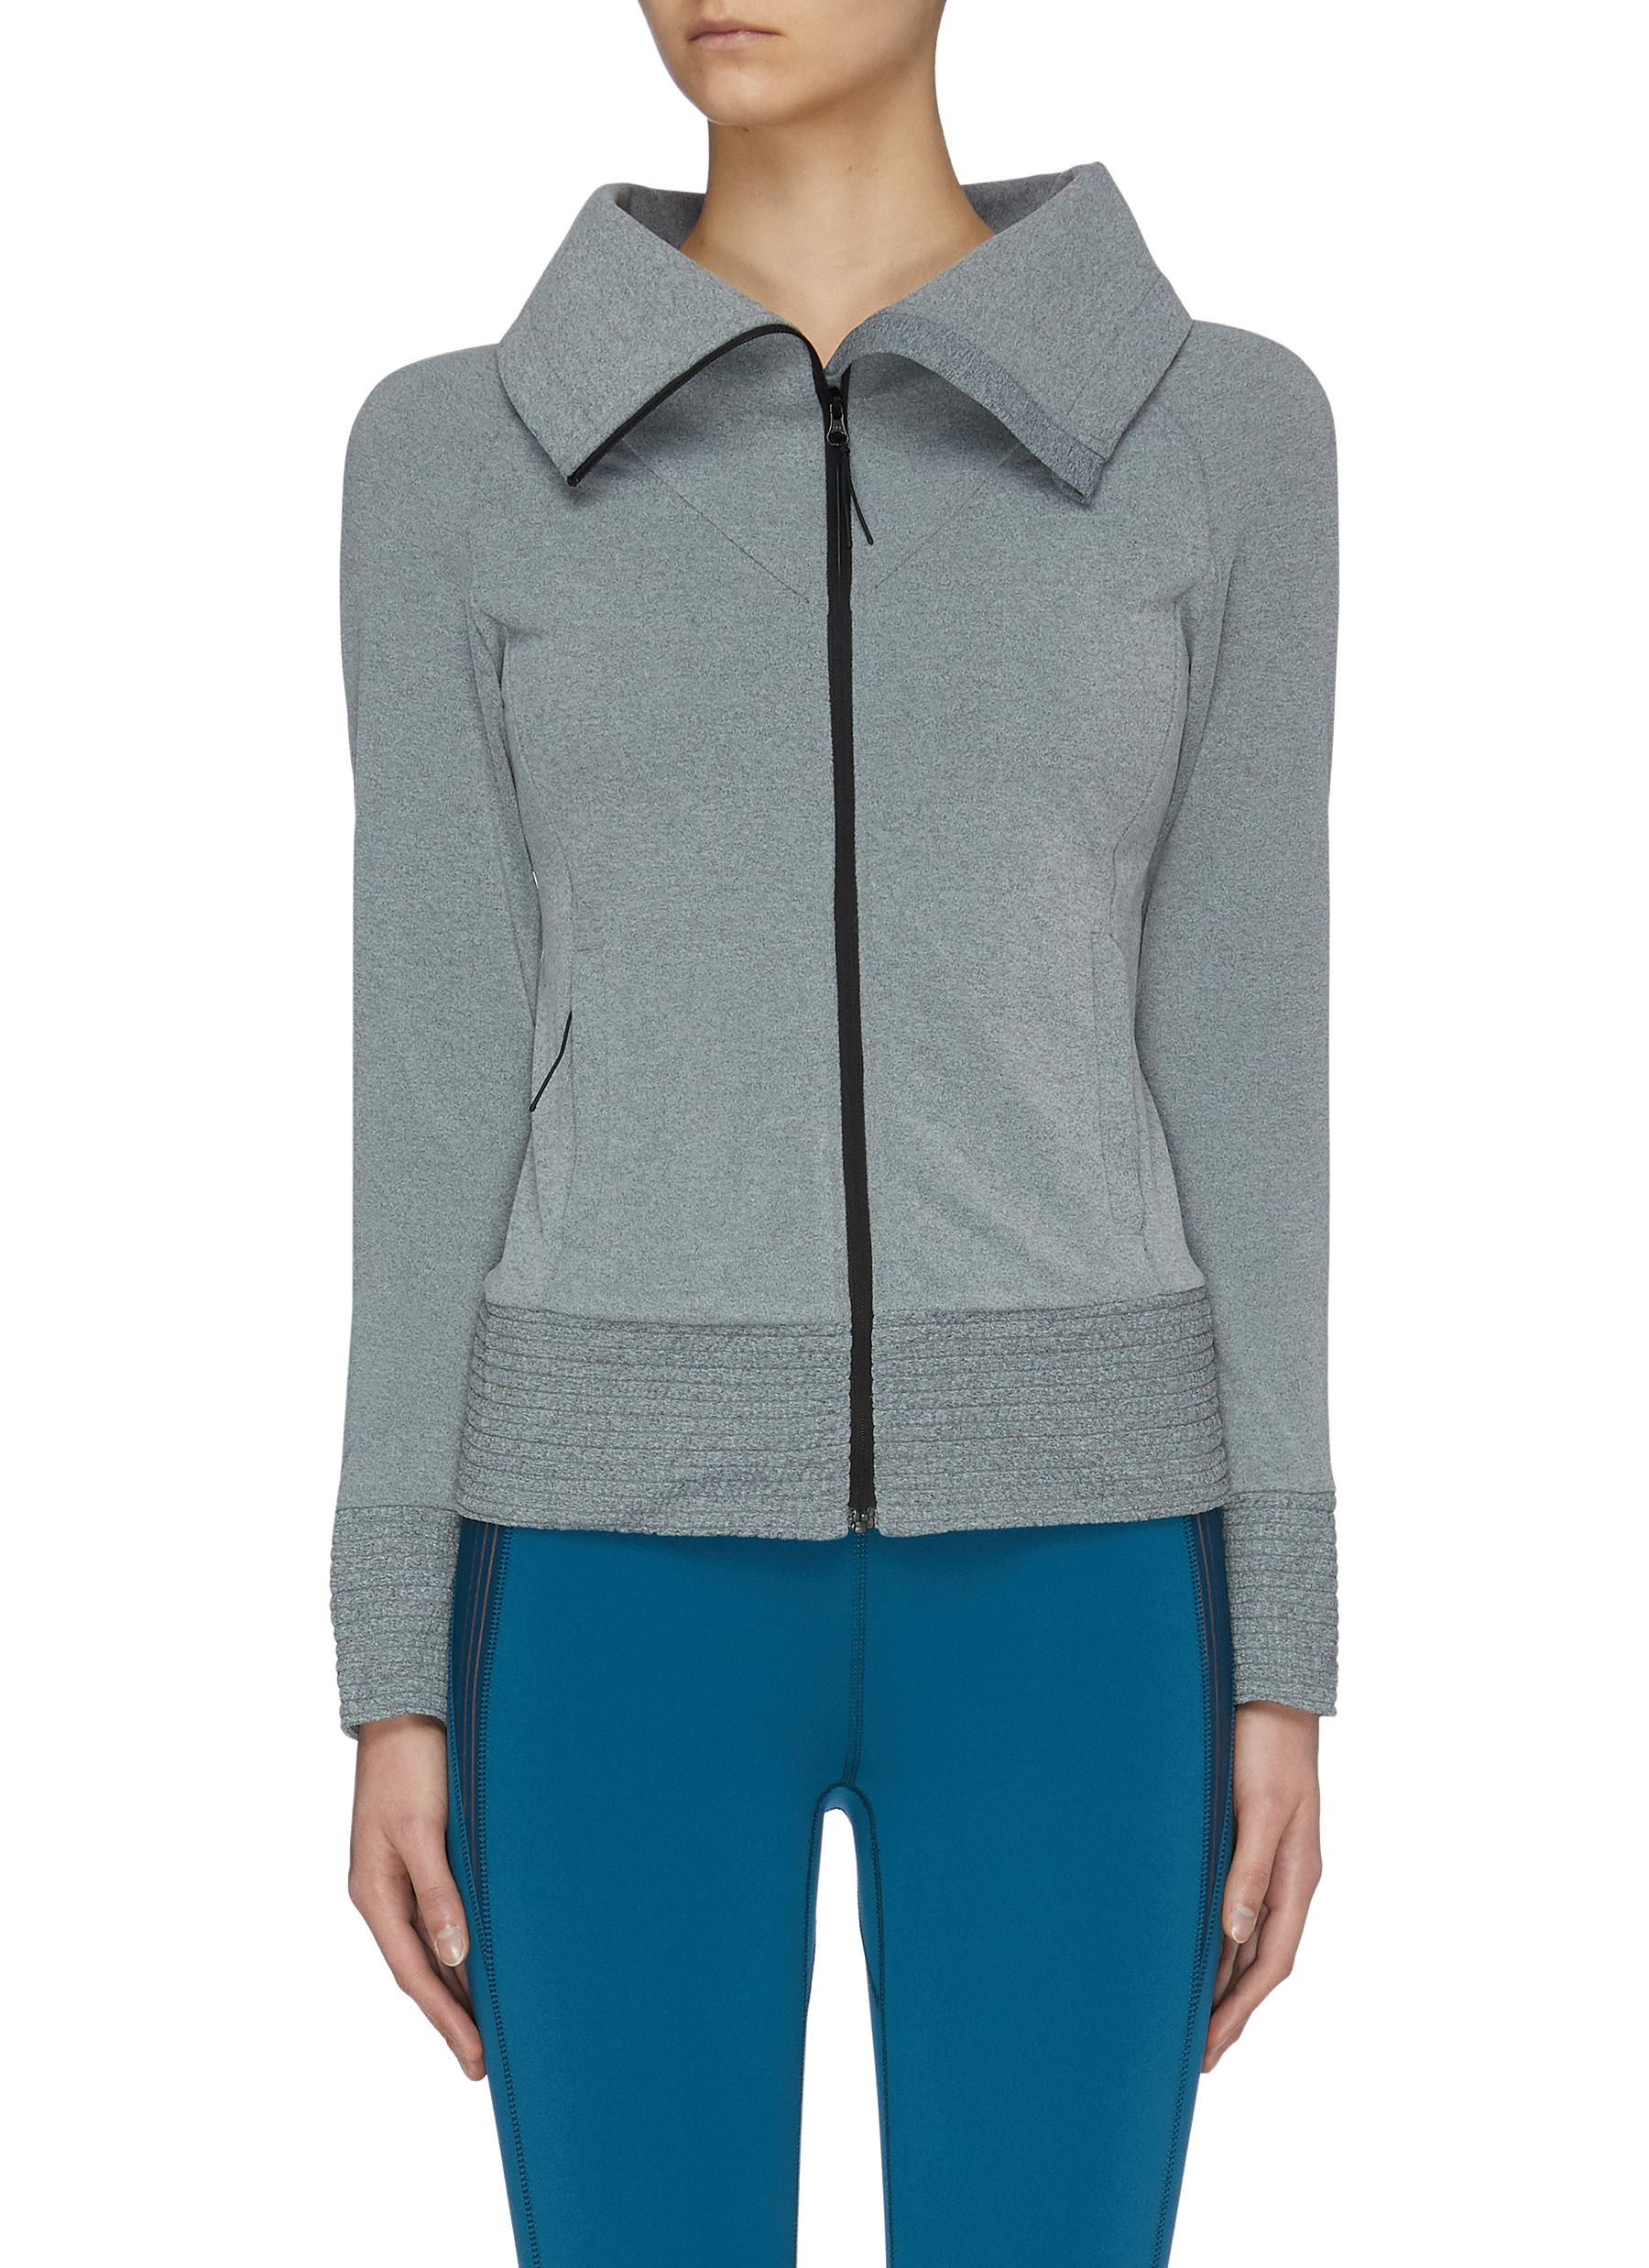 shop Particle Fever High Neck Fleece Jacket online